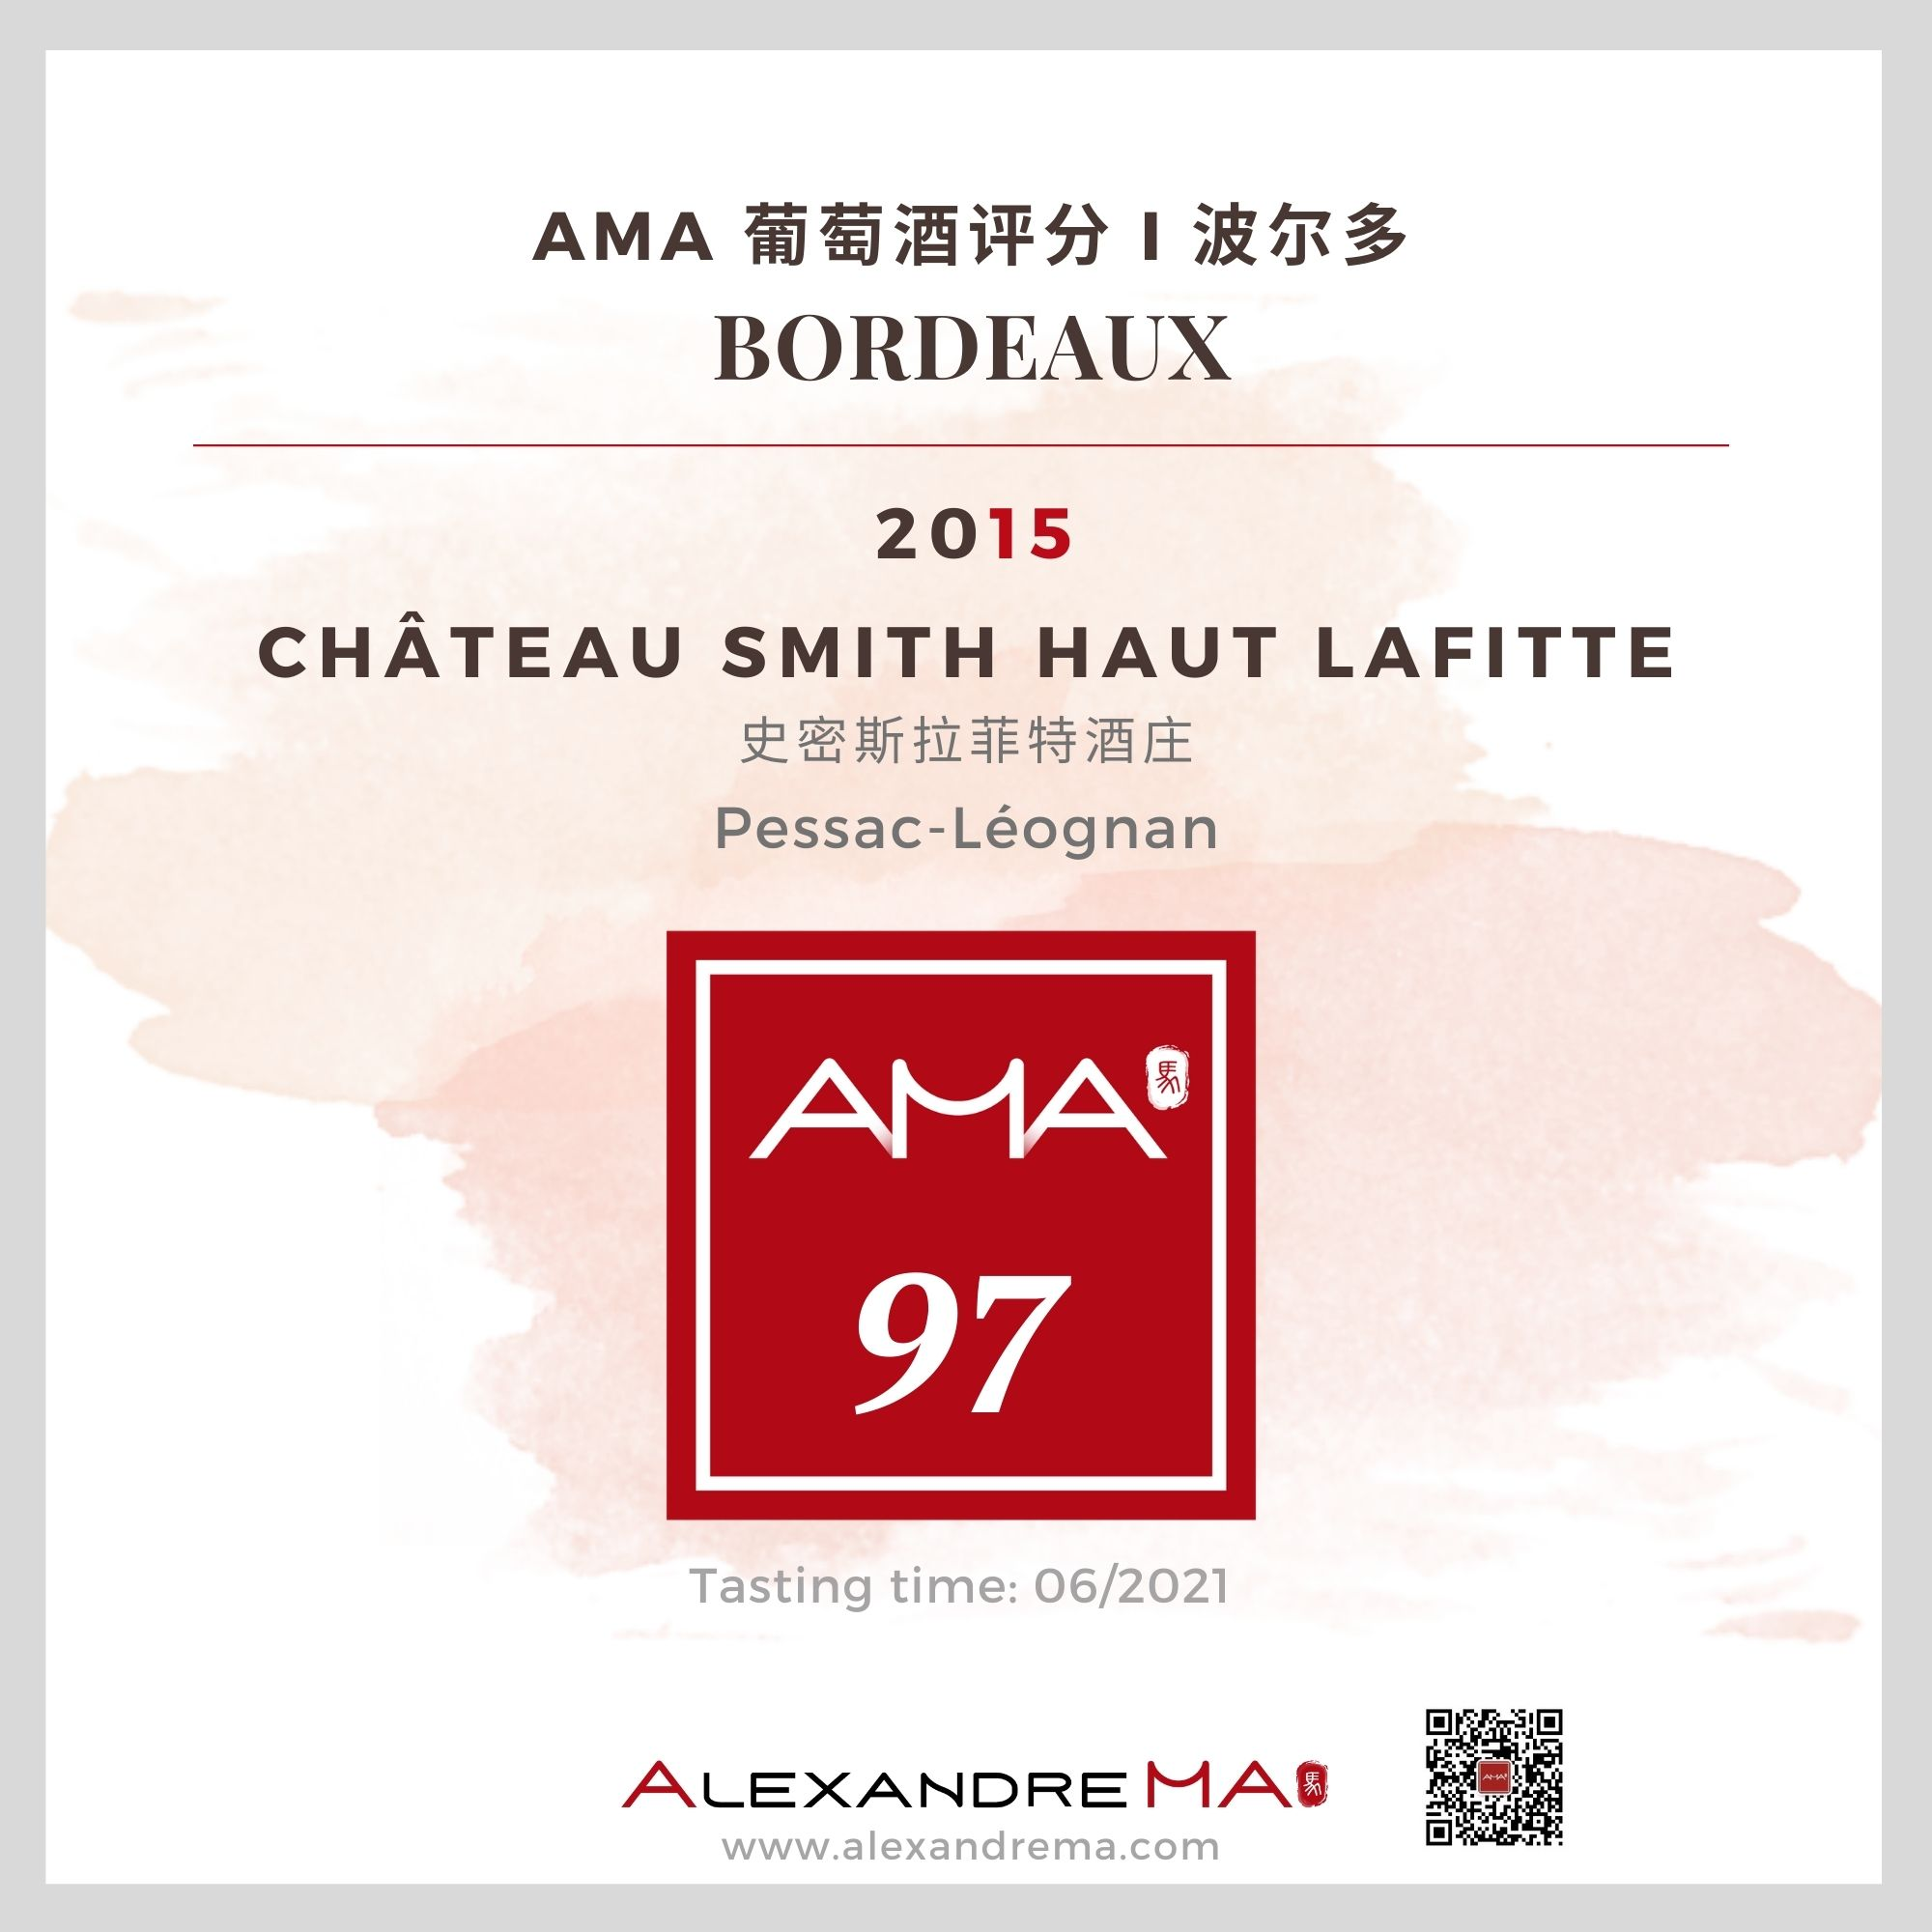 Château Smith Haut Lafitte 2015 - Alexandre MA